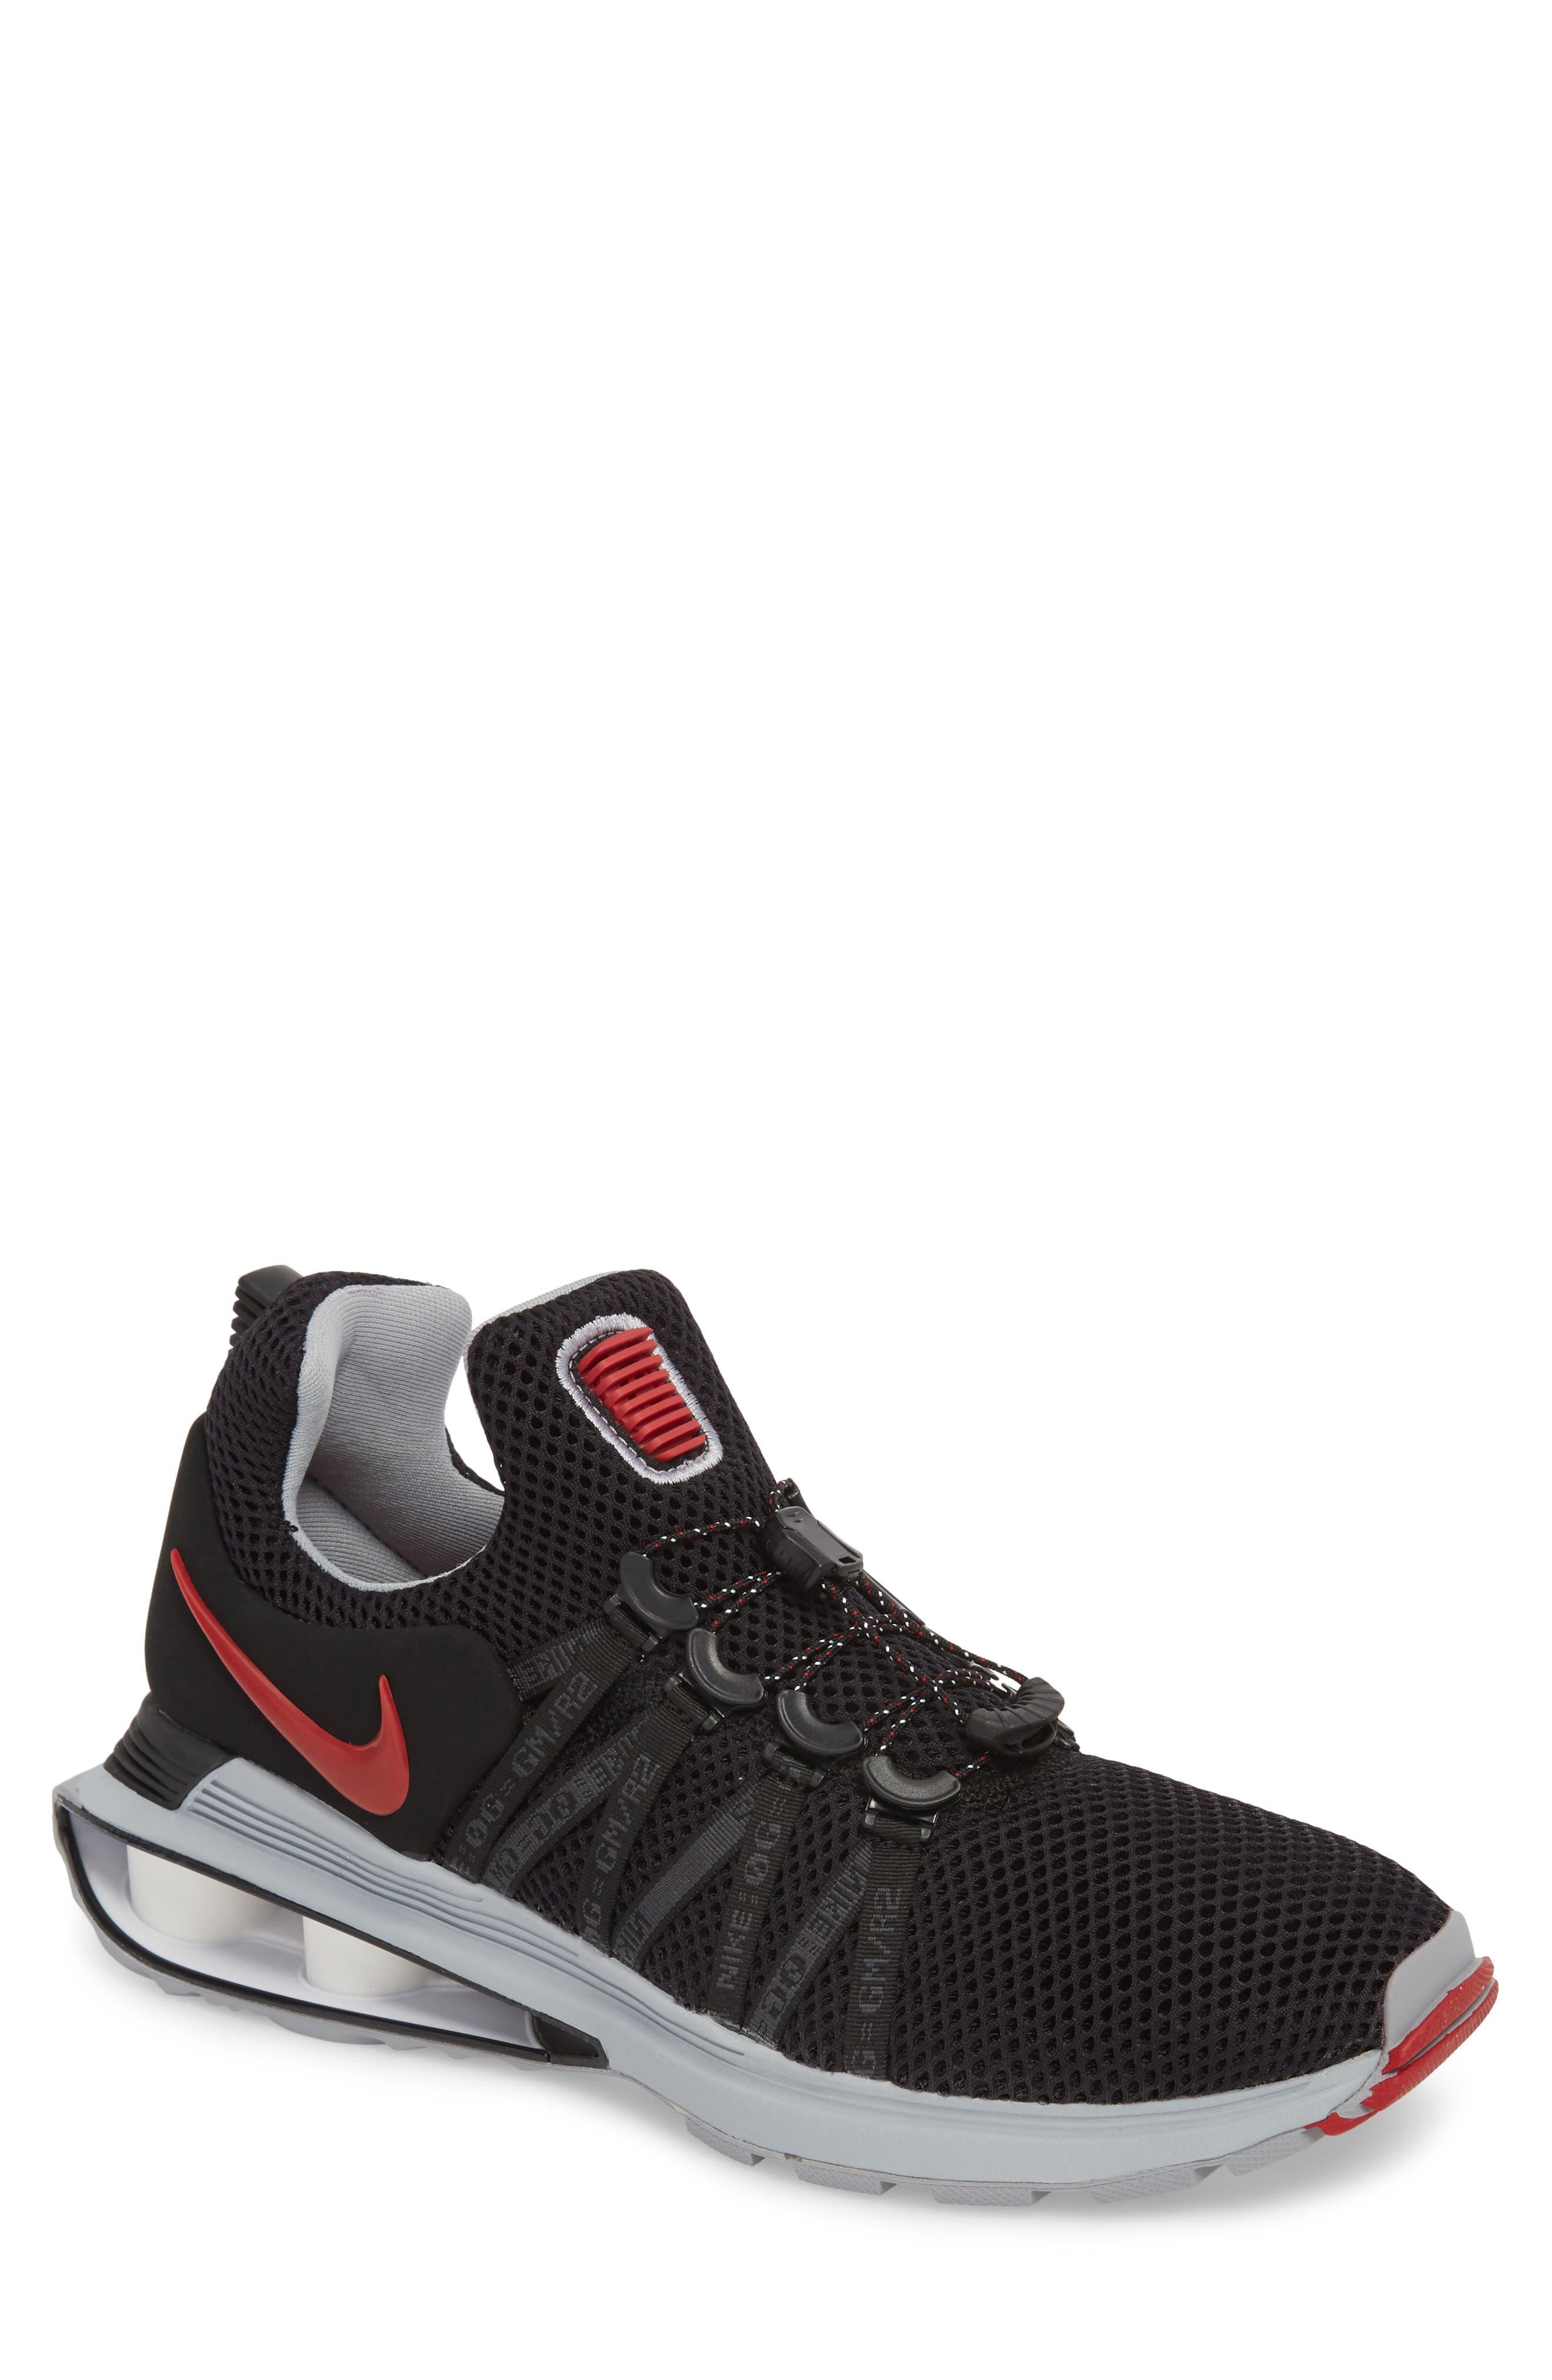 Shox Gravity Sneaker,                             Main thumbnail 1, color,                             016